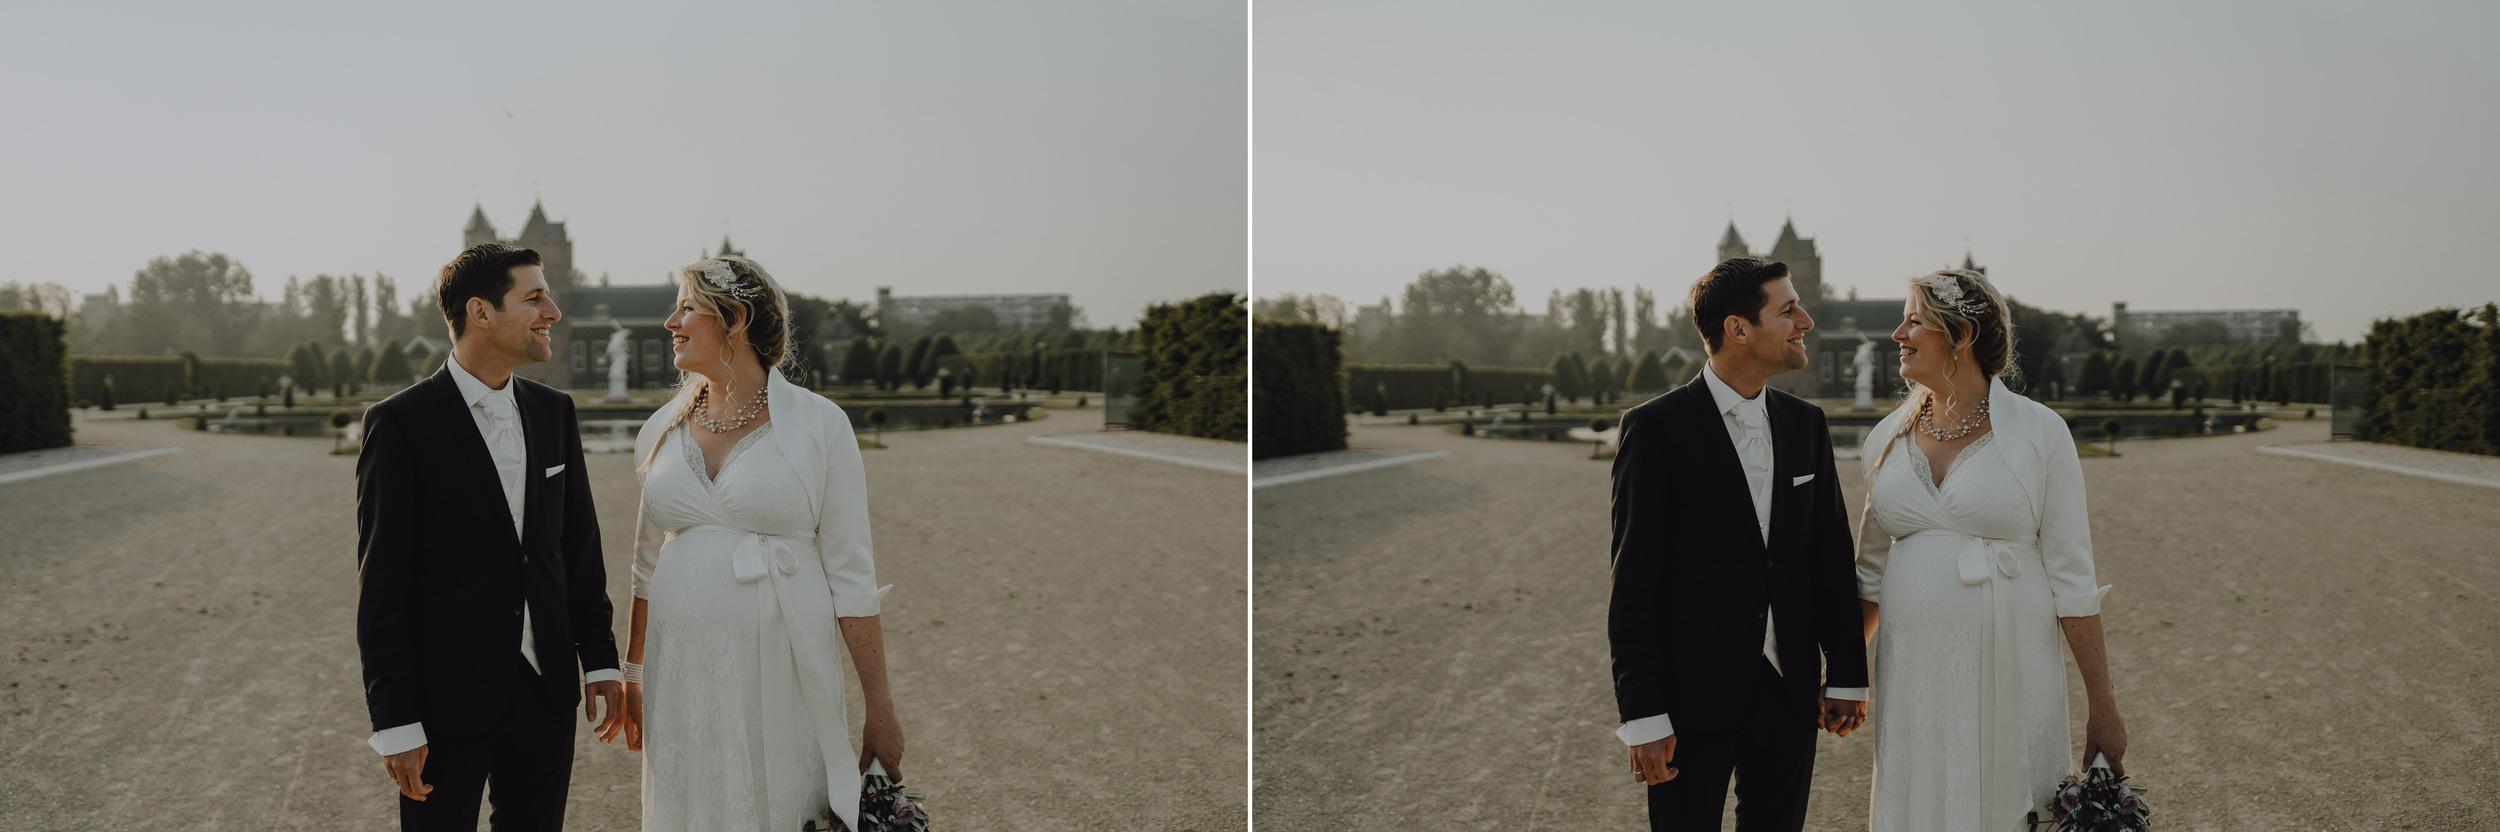 Bruidsfotografie Amsterdam - Portrets Bruidspaar